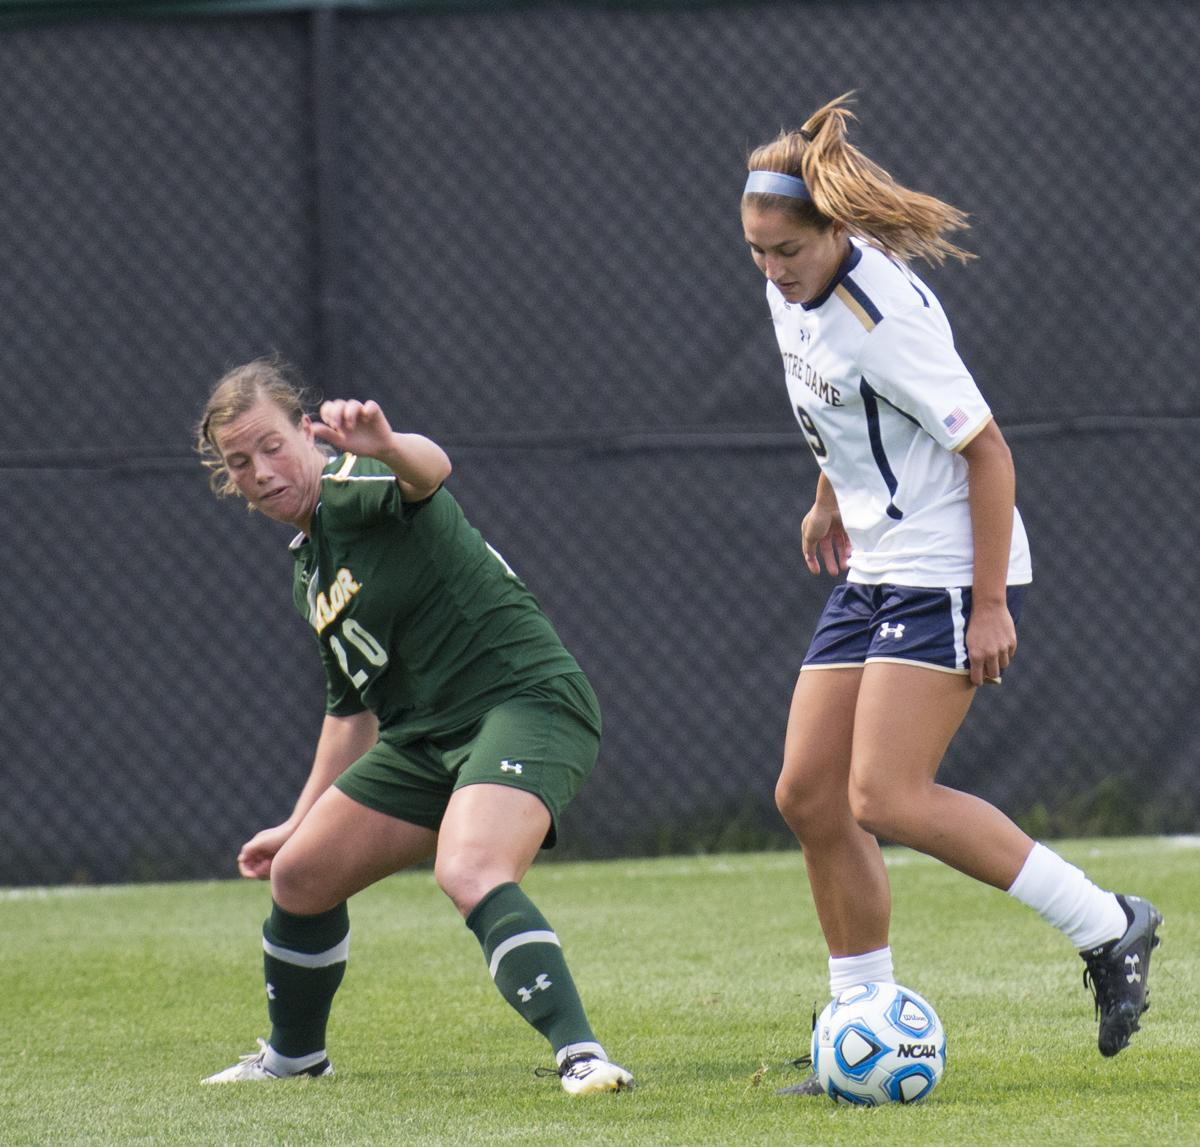 Irish senior forward Lauren Bohaboy dribbles around a Baylor defender in Notre Dame's 1-0 win over the Bears on Sept. 12.